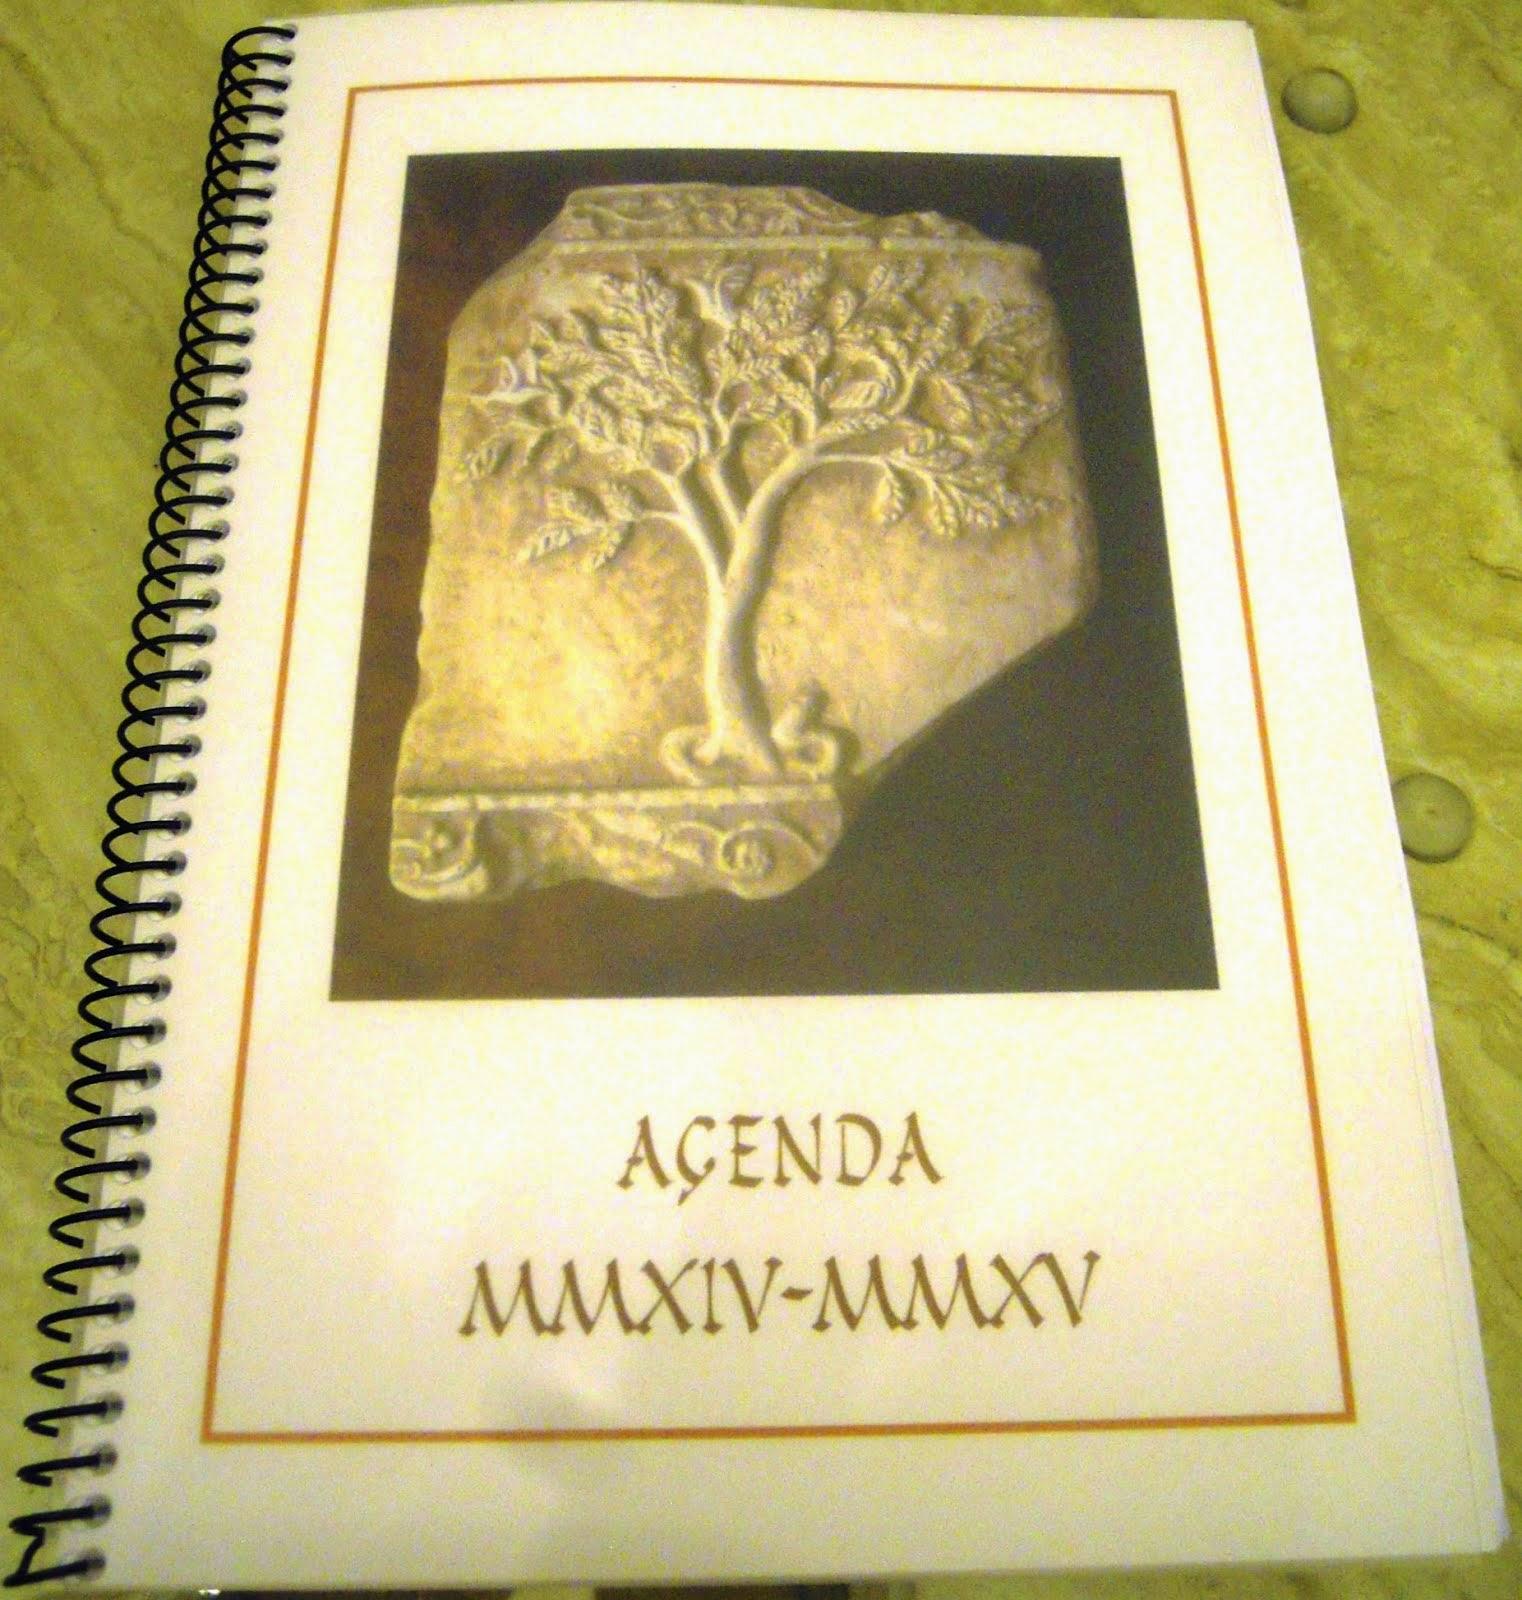 AGENDA LATINA-GRIEGA MMXIV-MMXV